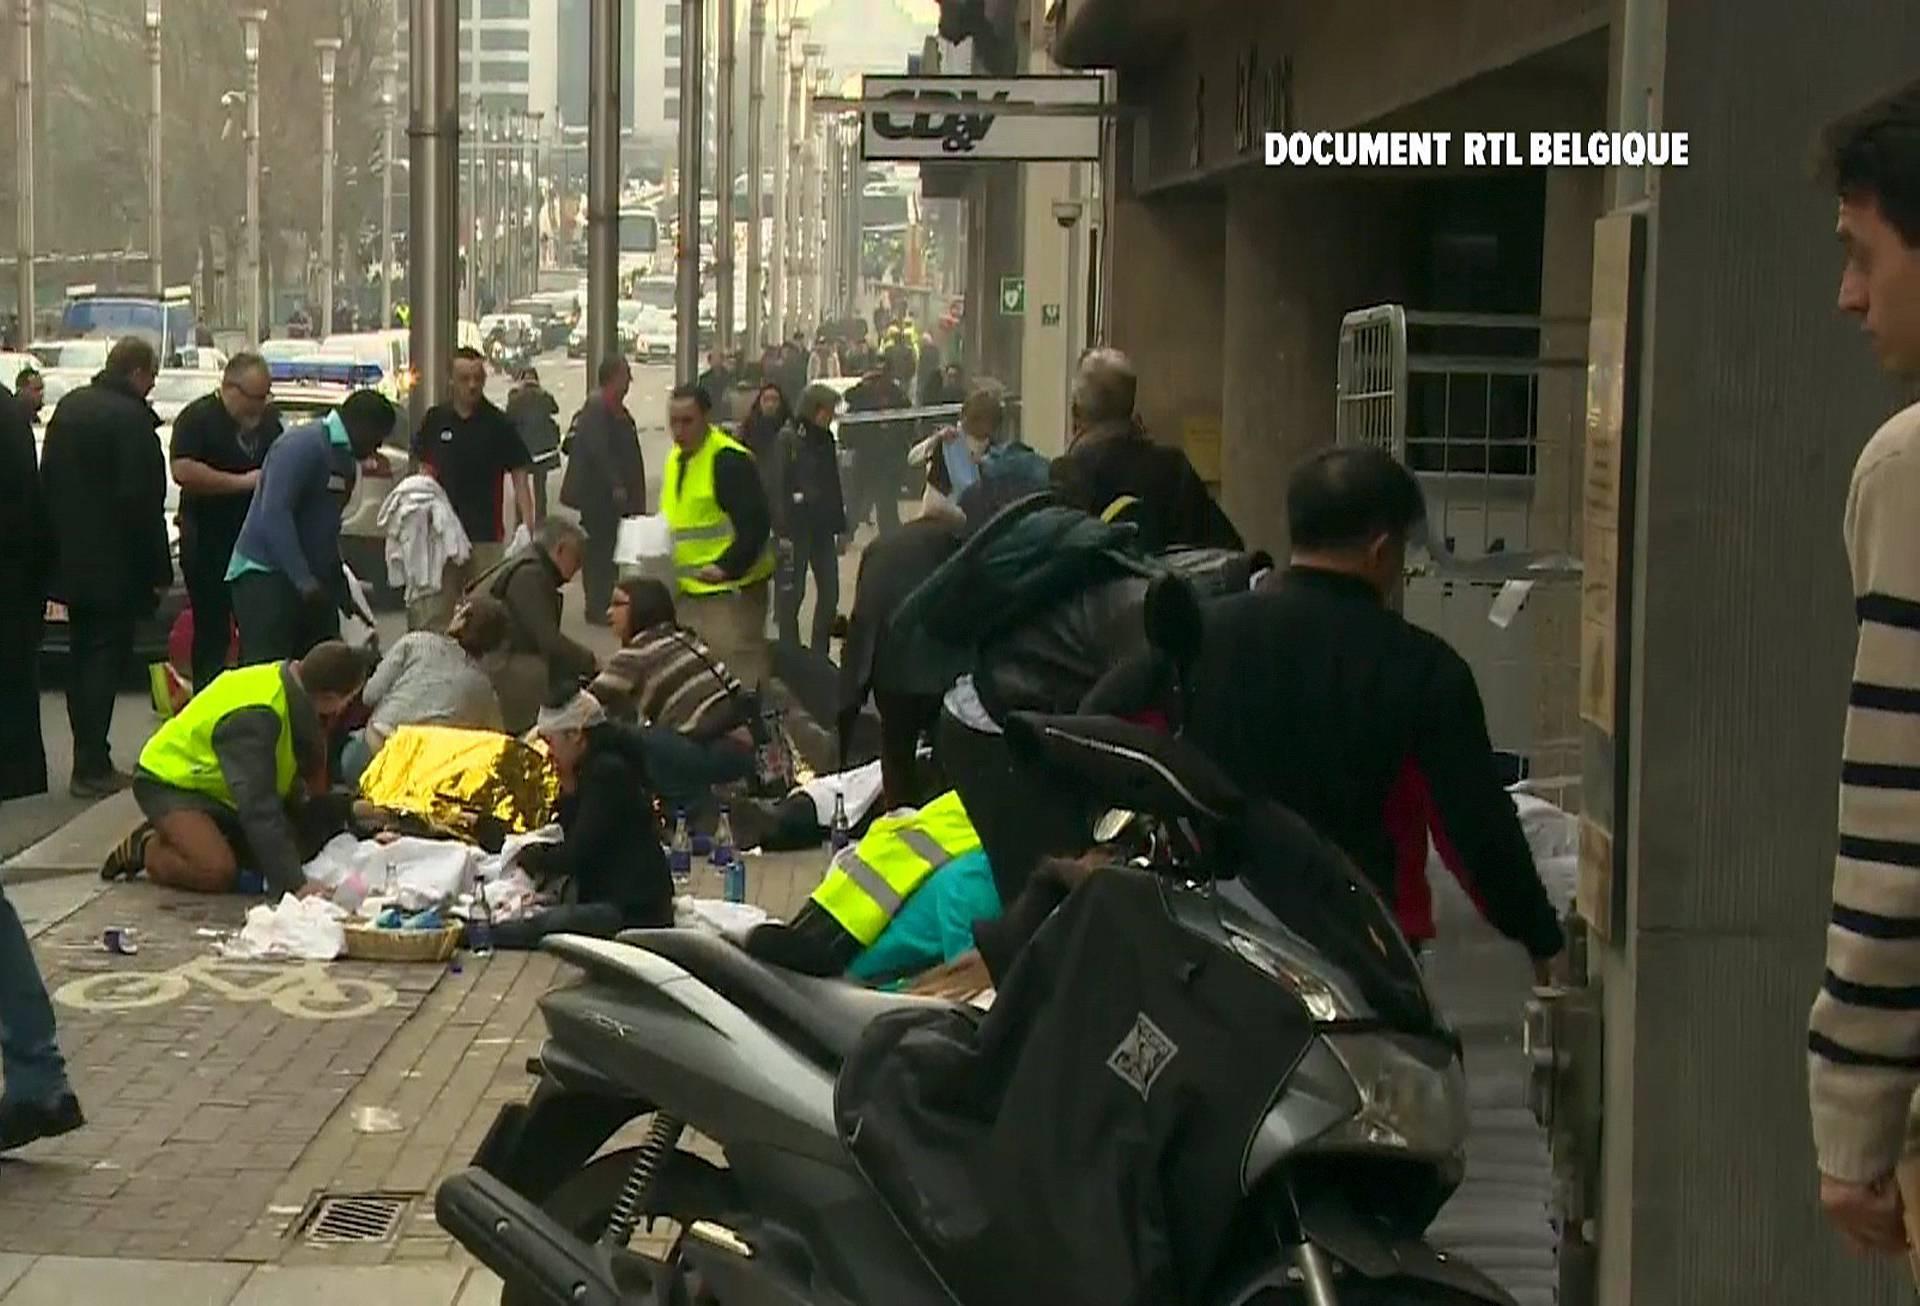 Snimila ga je  kamera: Bombaš iz metroa je imao pomagača?